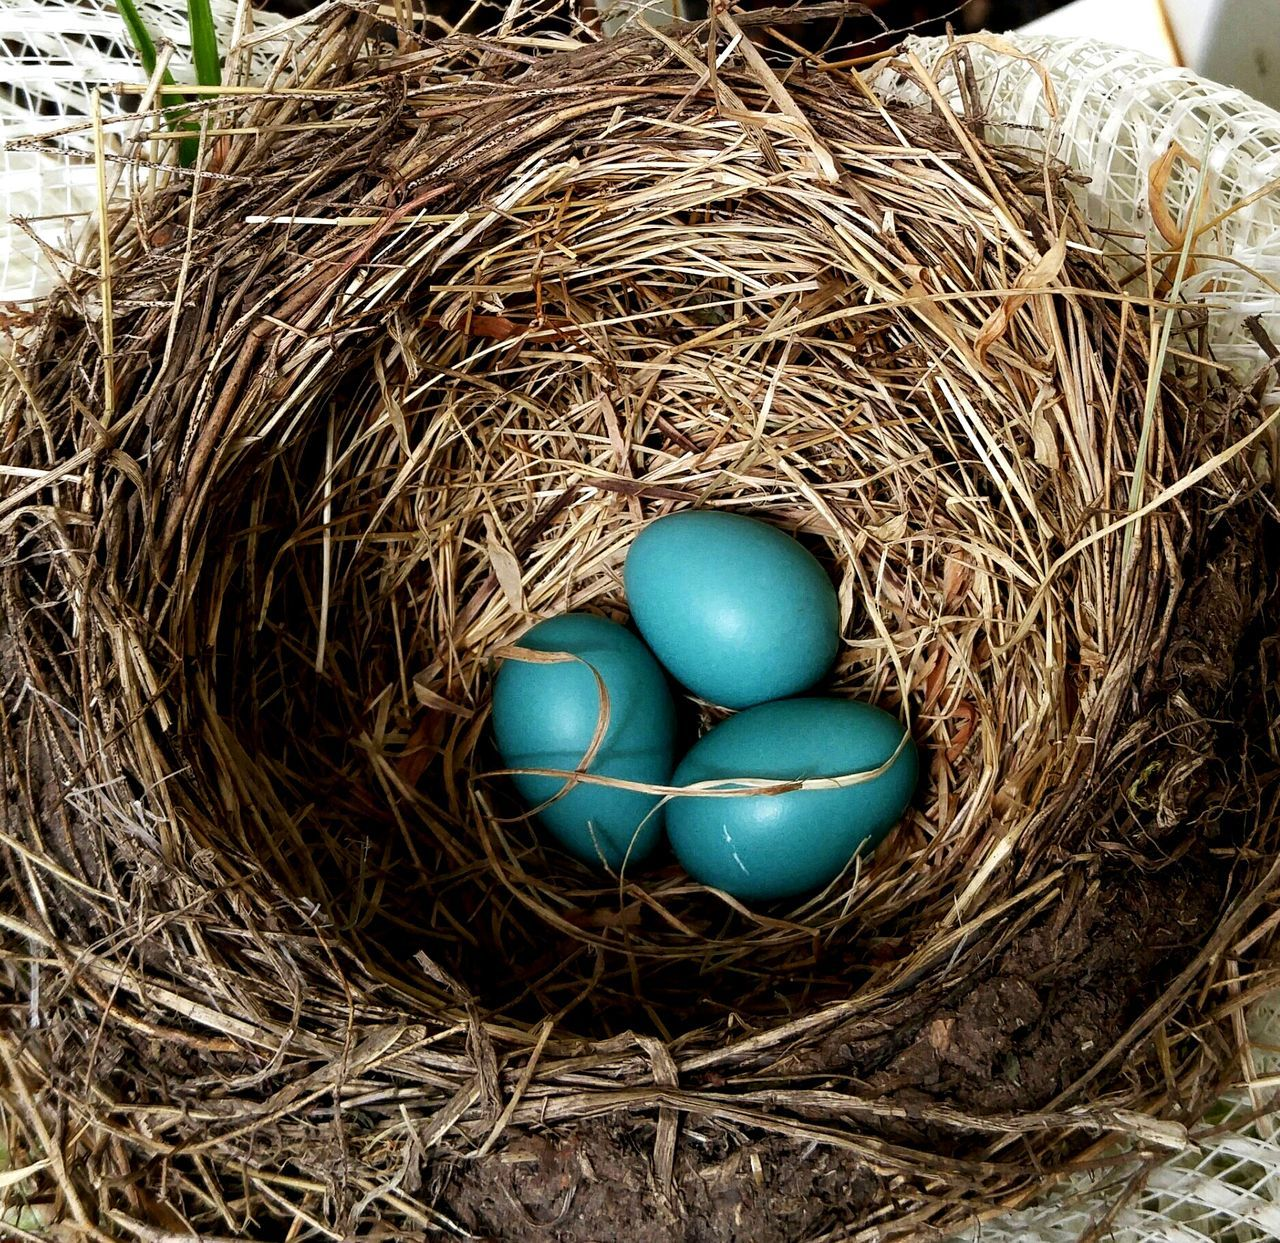 Bird Photography Birdnest Bird Nest Birdnesup Close And Personal Bird Nest On Wreath Nature's Diversities